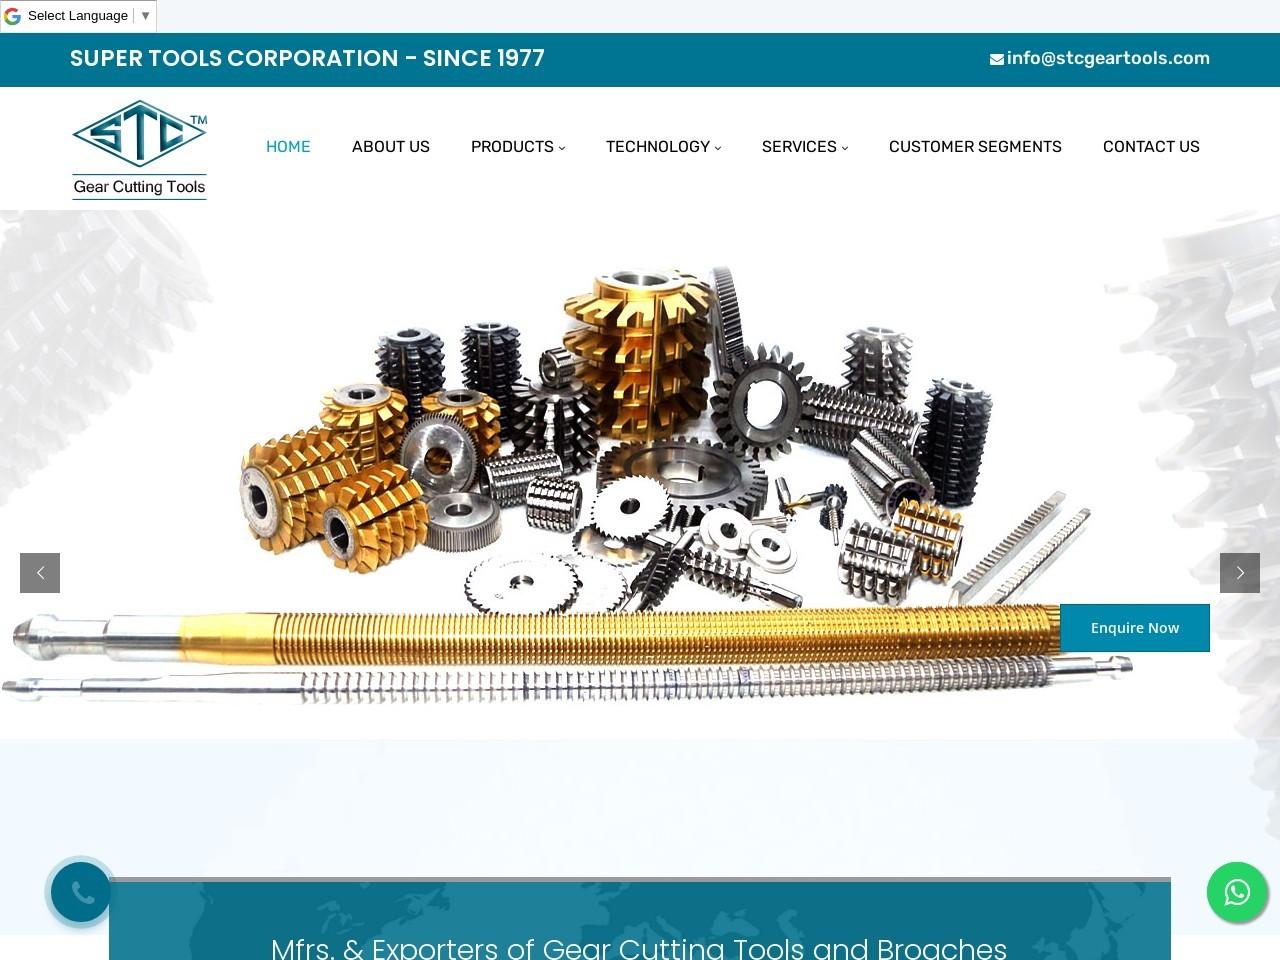 Carbide Hob Cutter Manufacturers | Solid Carbide Gear Hob